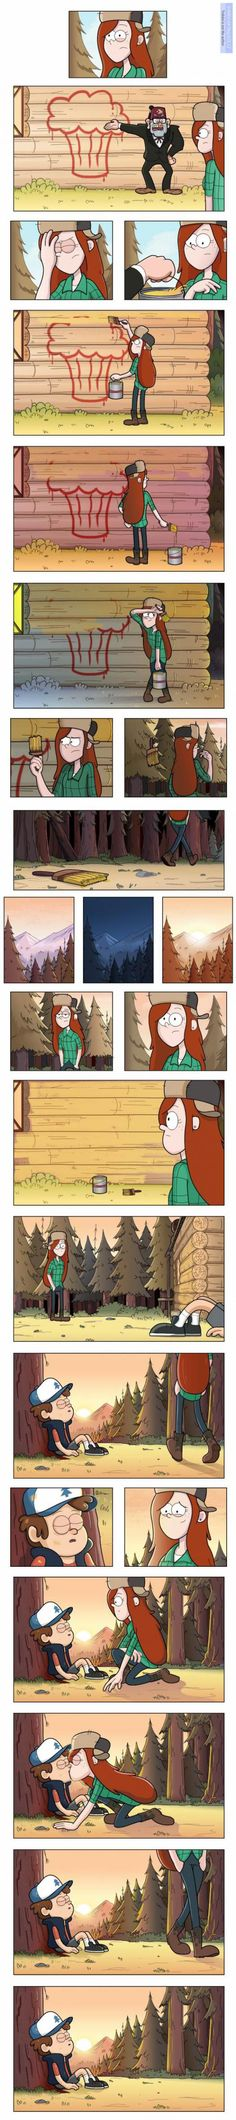 Gravity Falls 😍😍😍